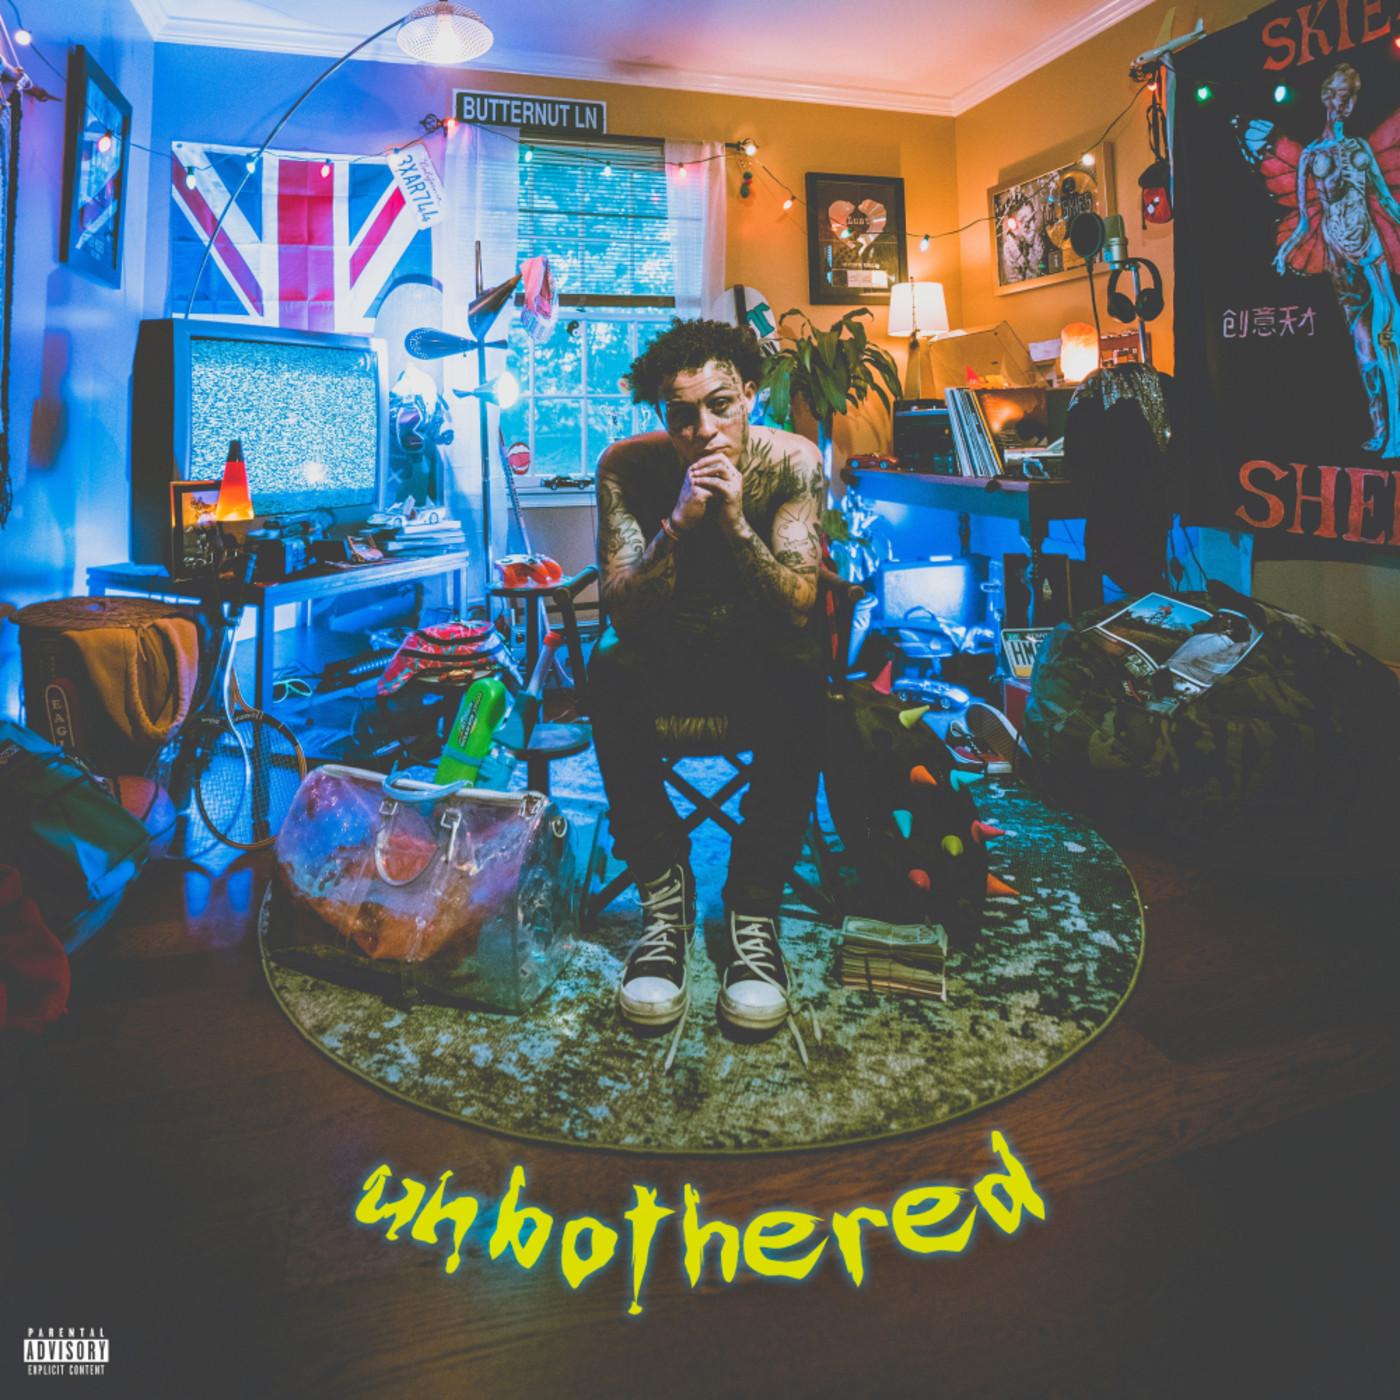 Listen to Lil Skies' Album 'Unbothered' f/ Lil Durk and Wiz Khalifa |  Complex